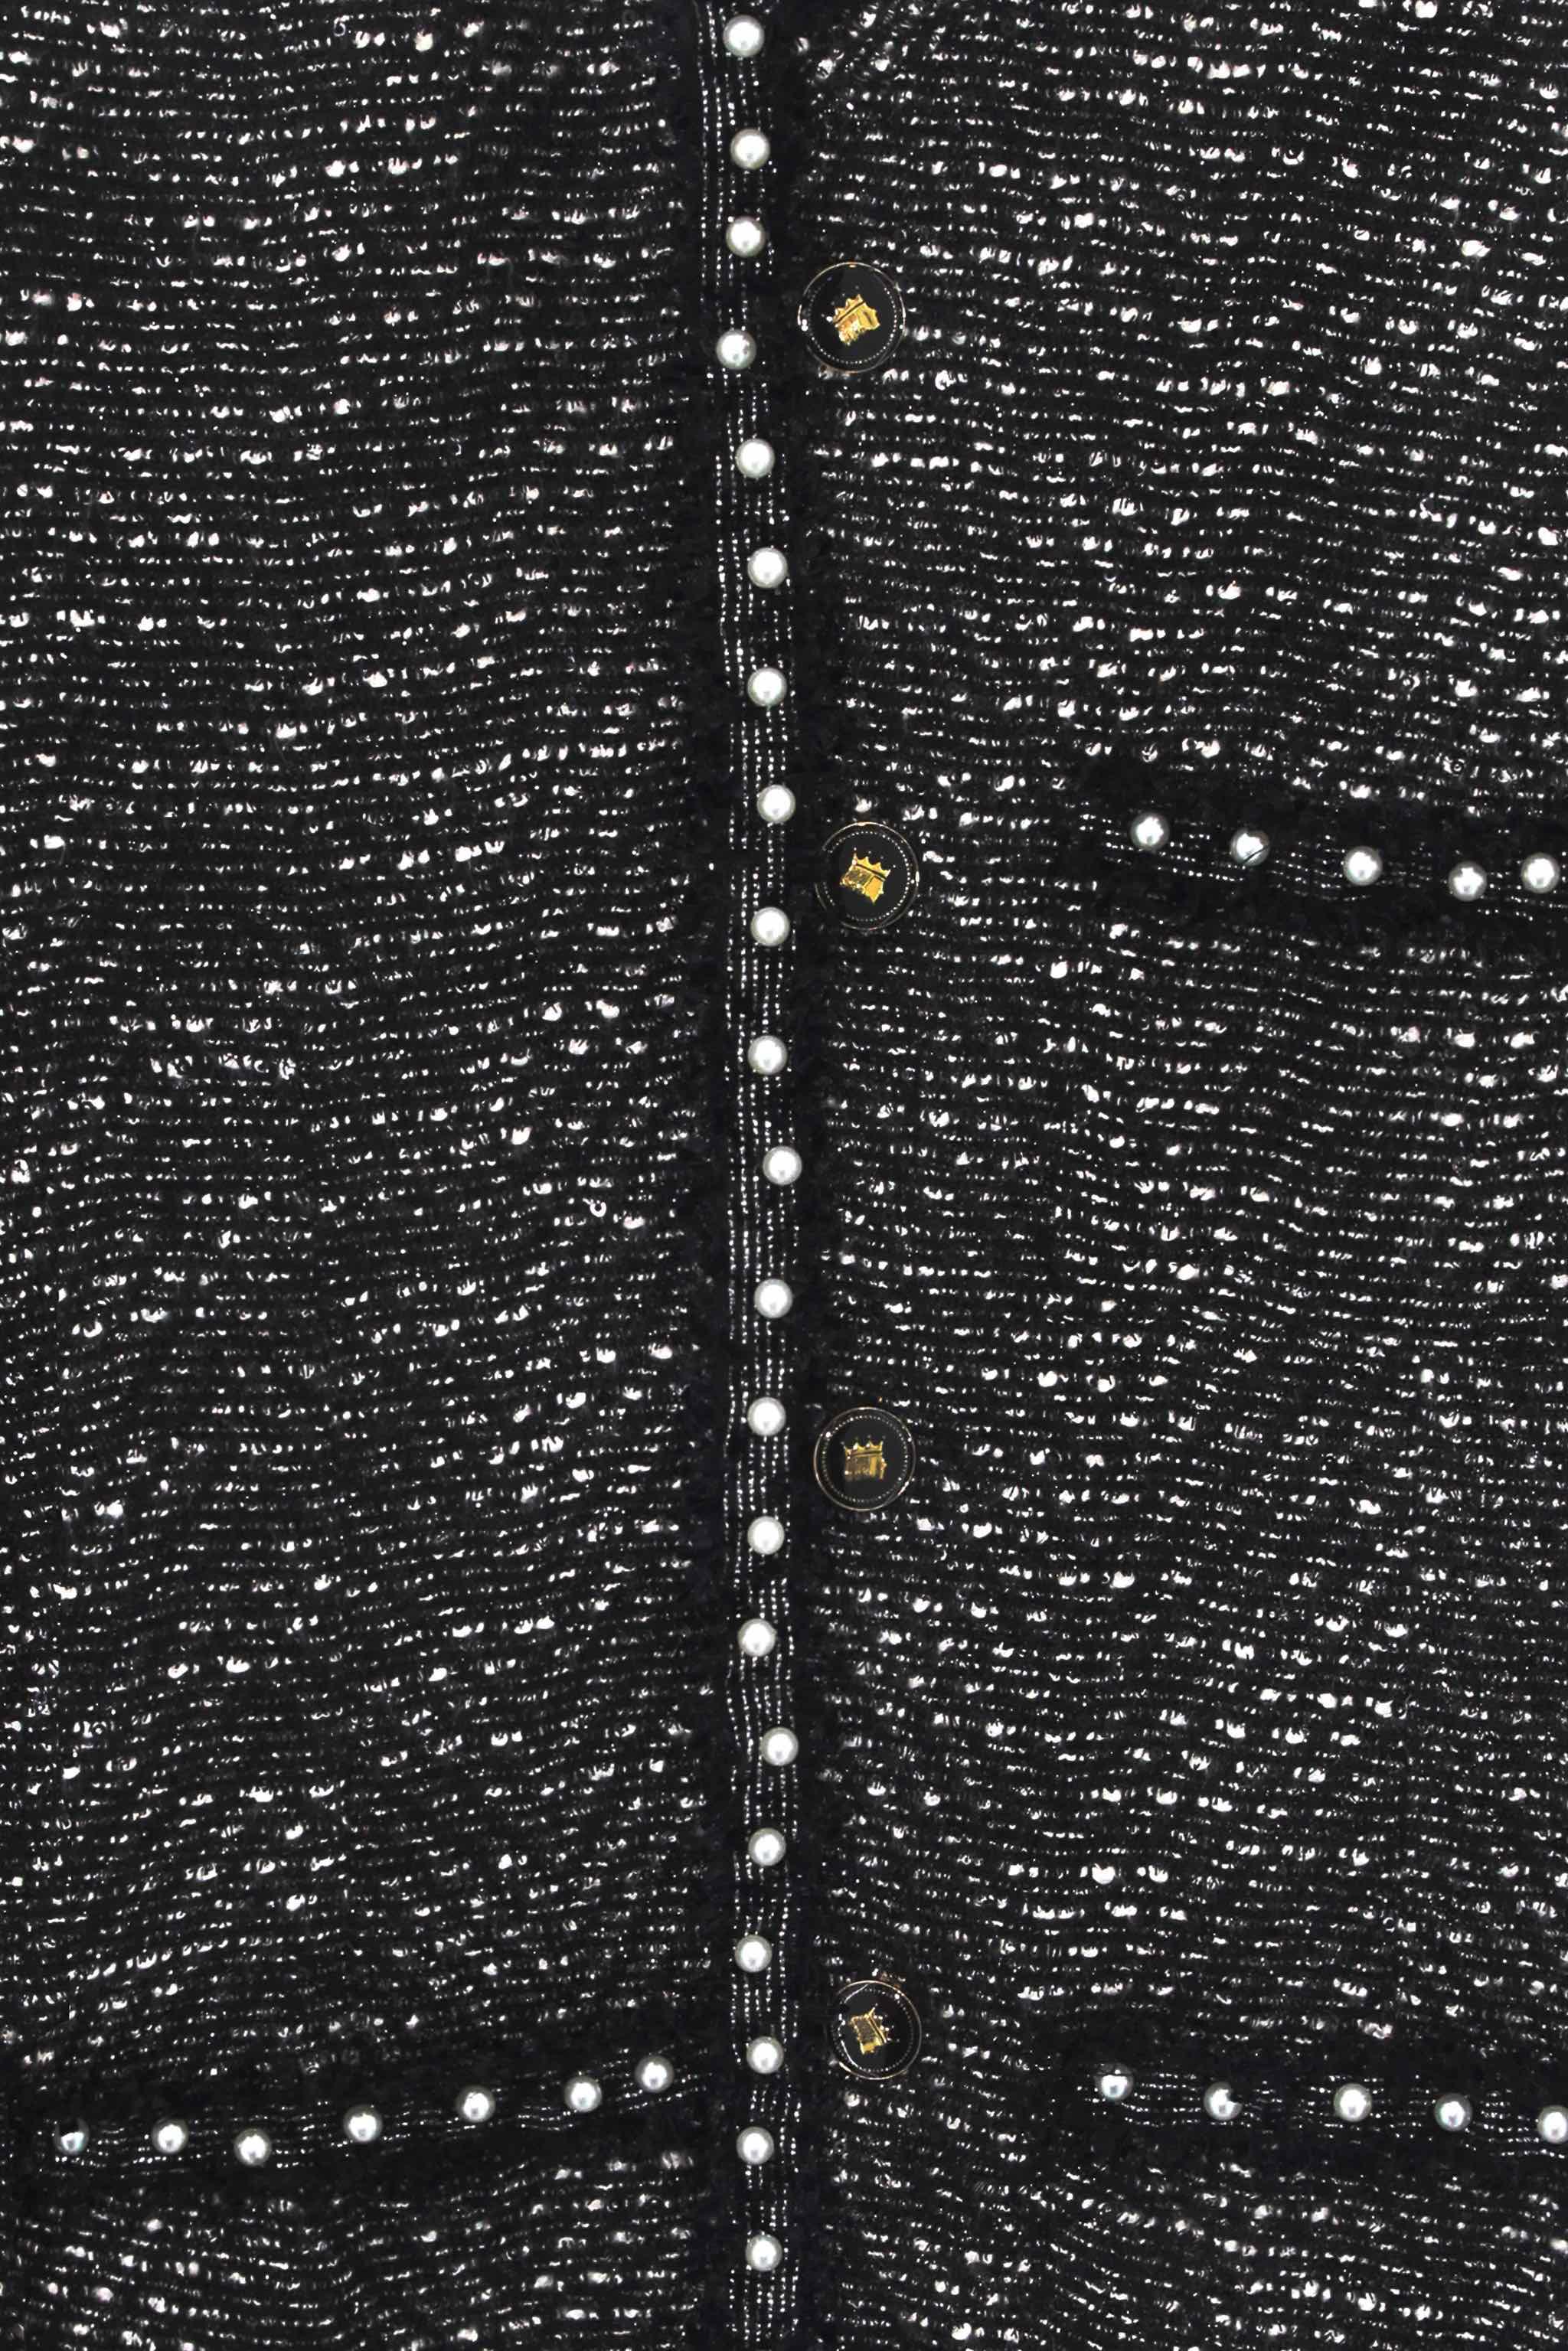 Áo Lak Studios Glitter Grey Tweed with Peal Trim Jackets